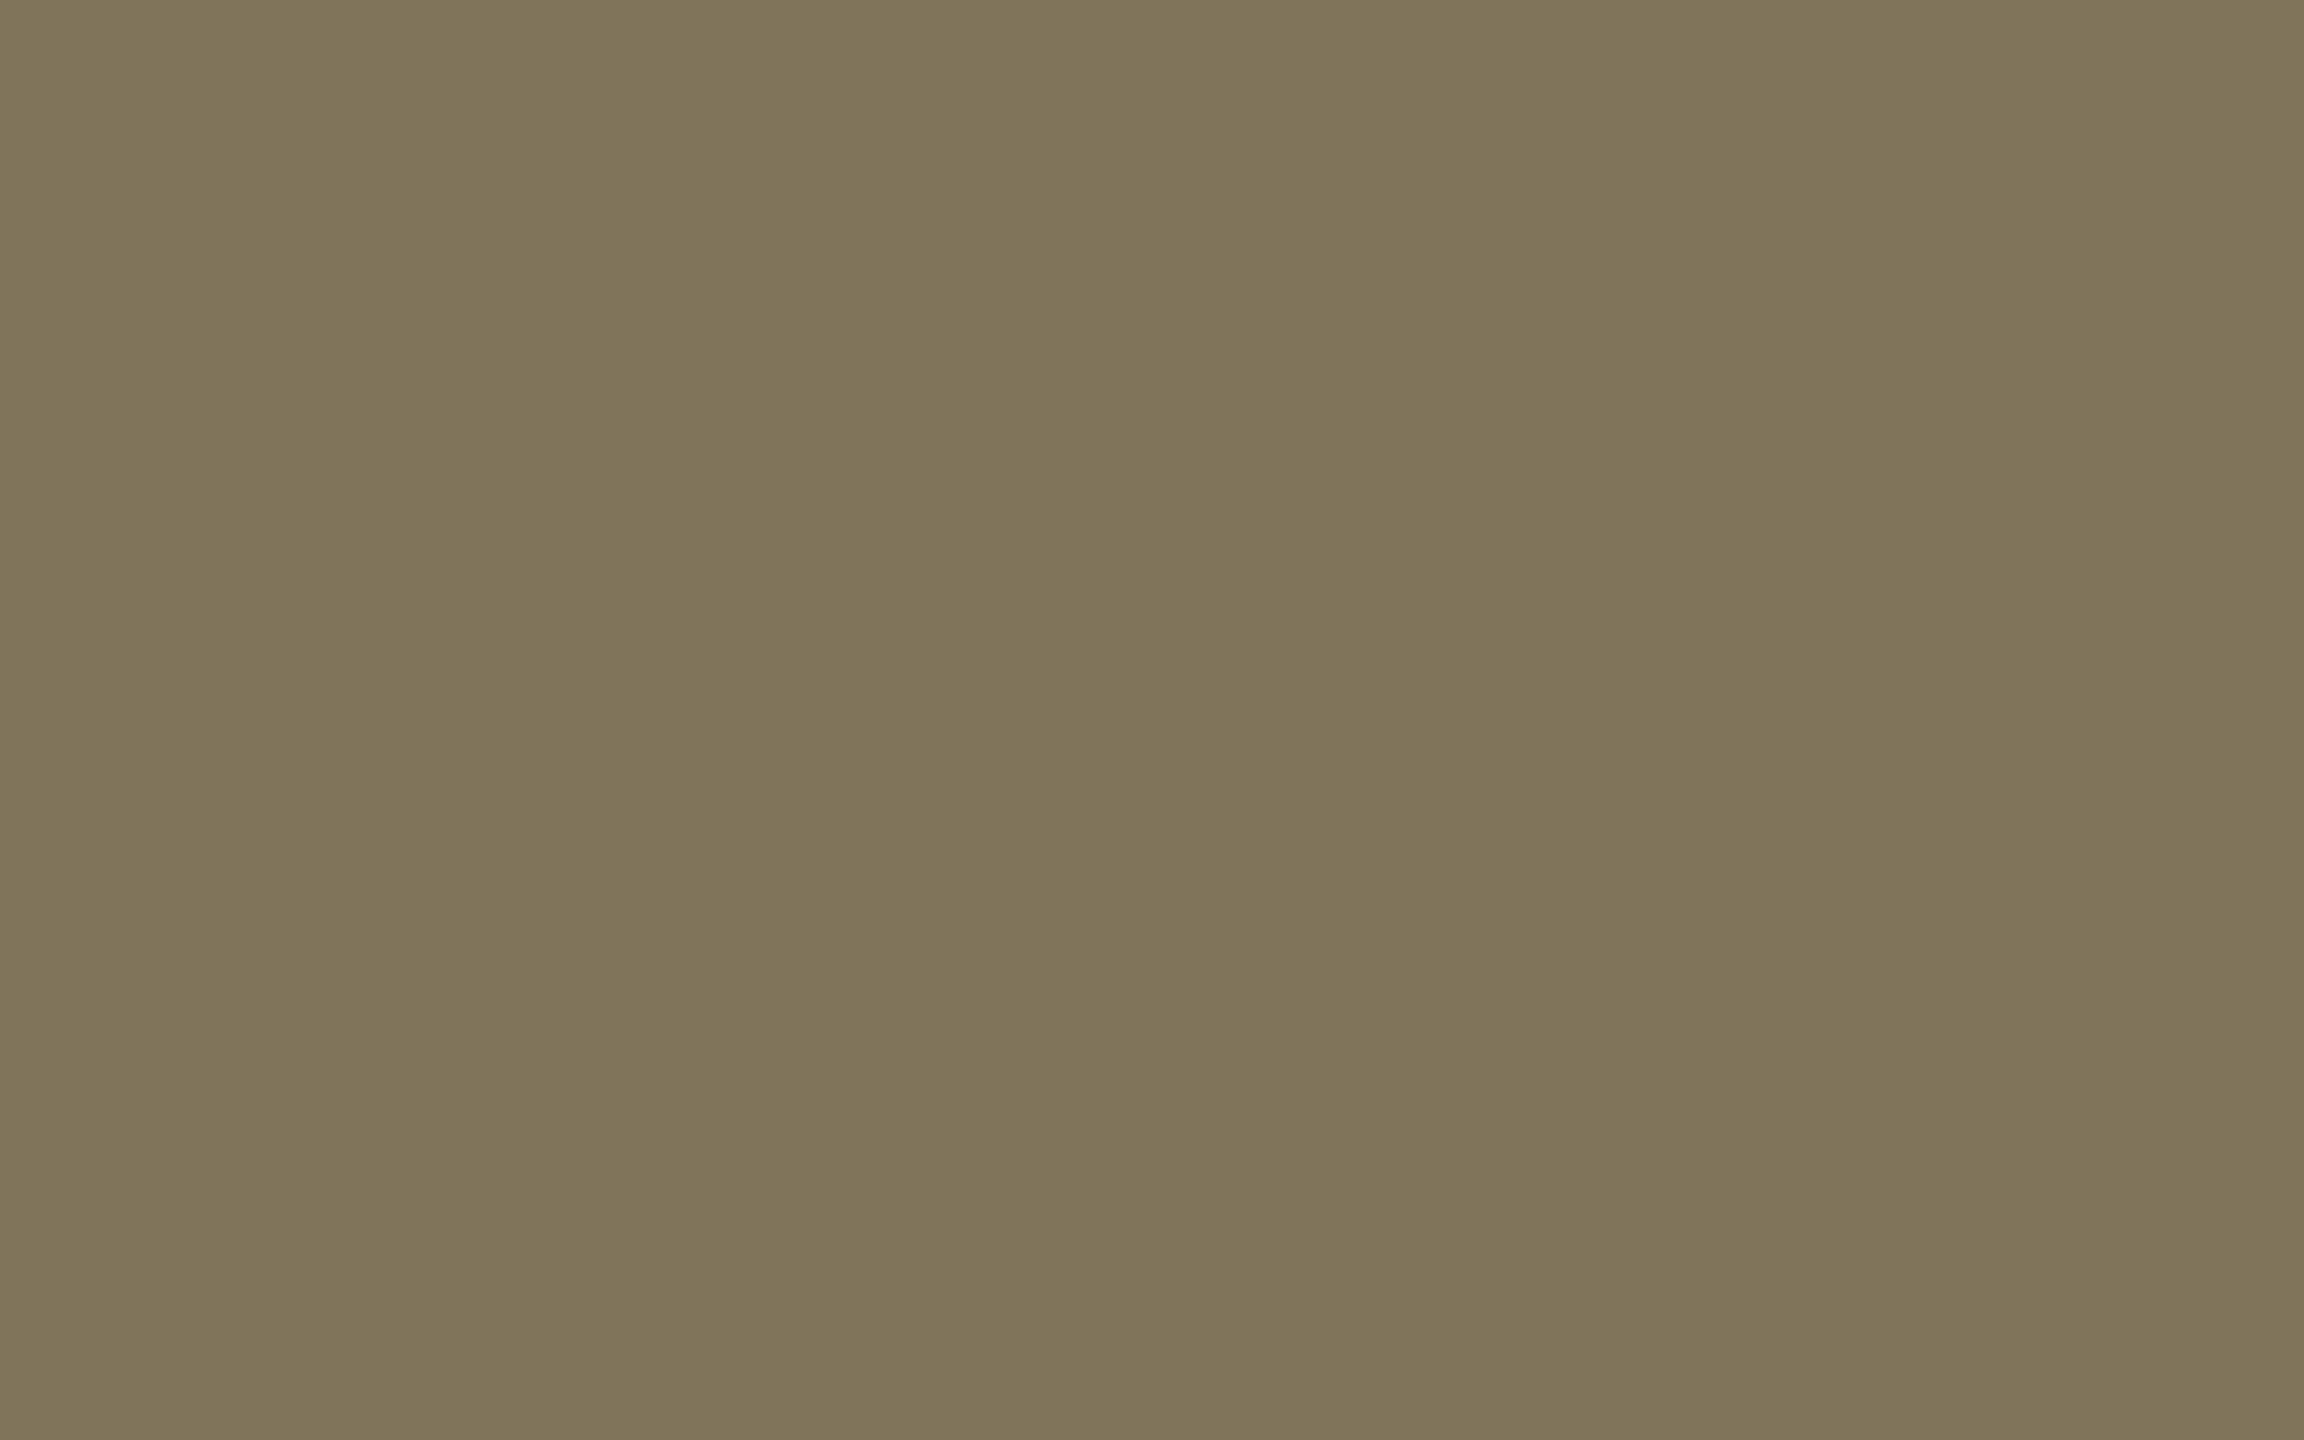 2304x1440 Spanish Bistre Solid Color Background